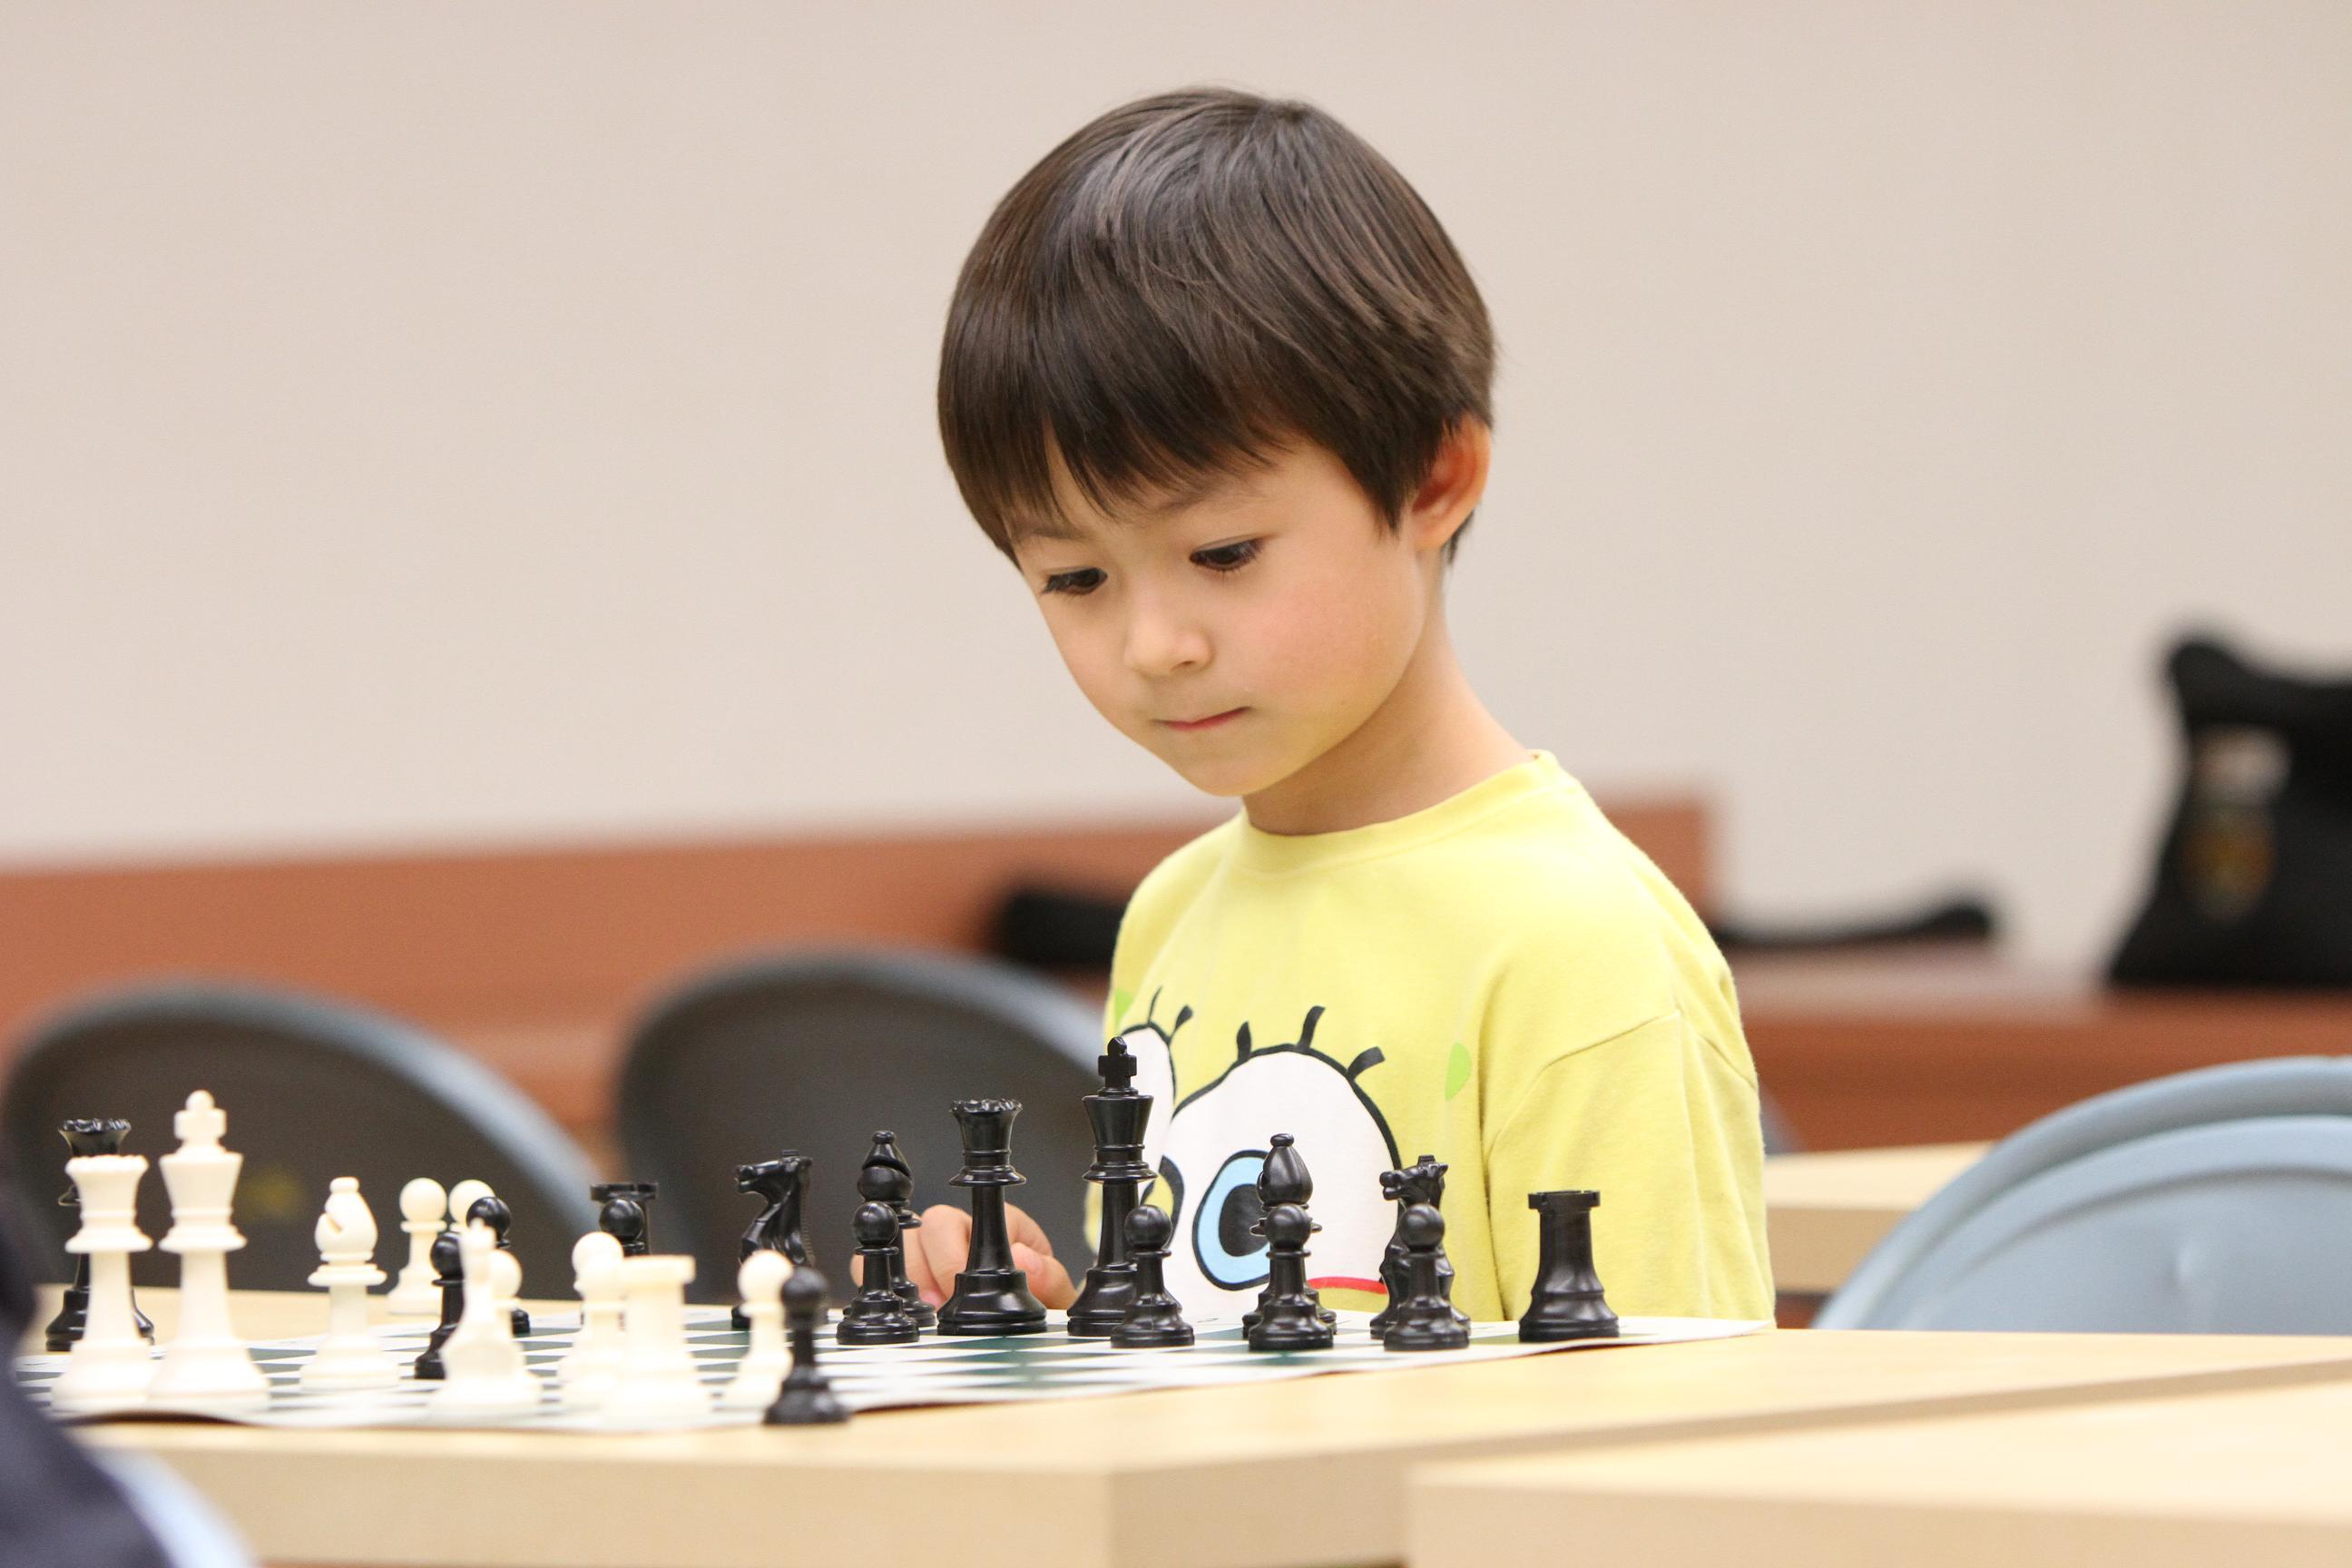 Follow Directions In School Chess - Enlighten Enri...